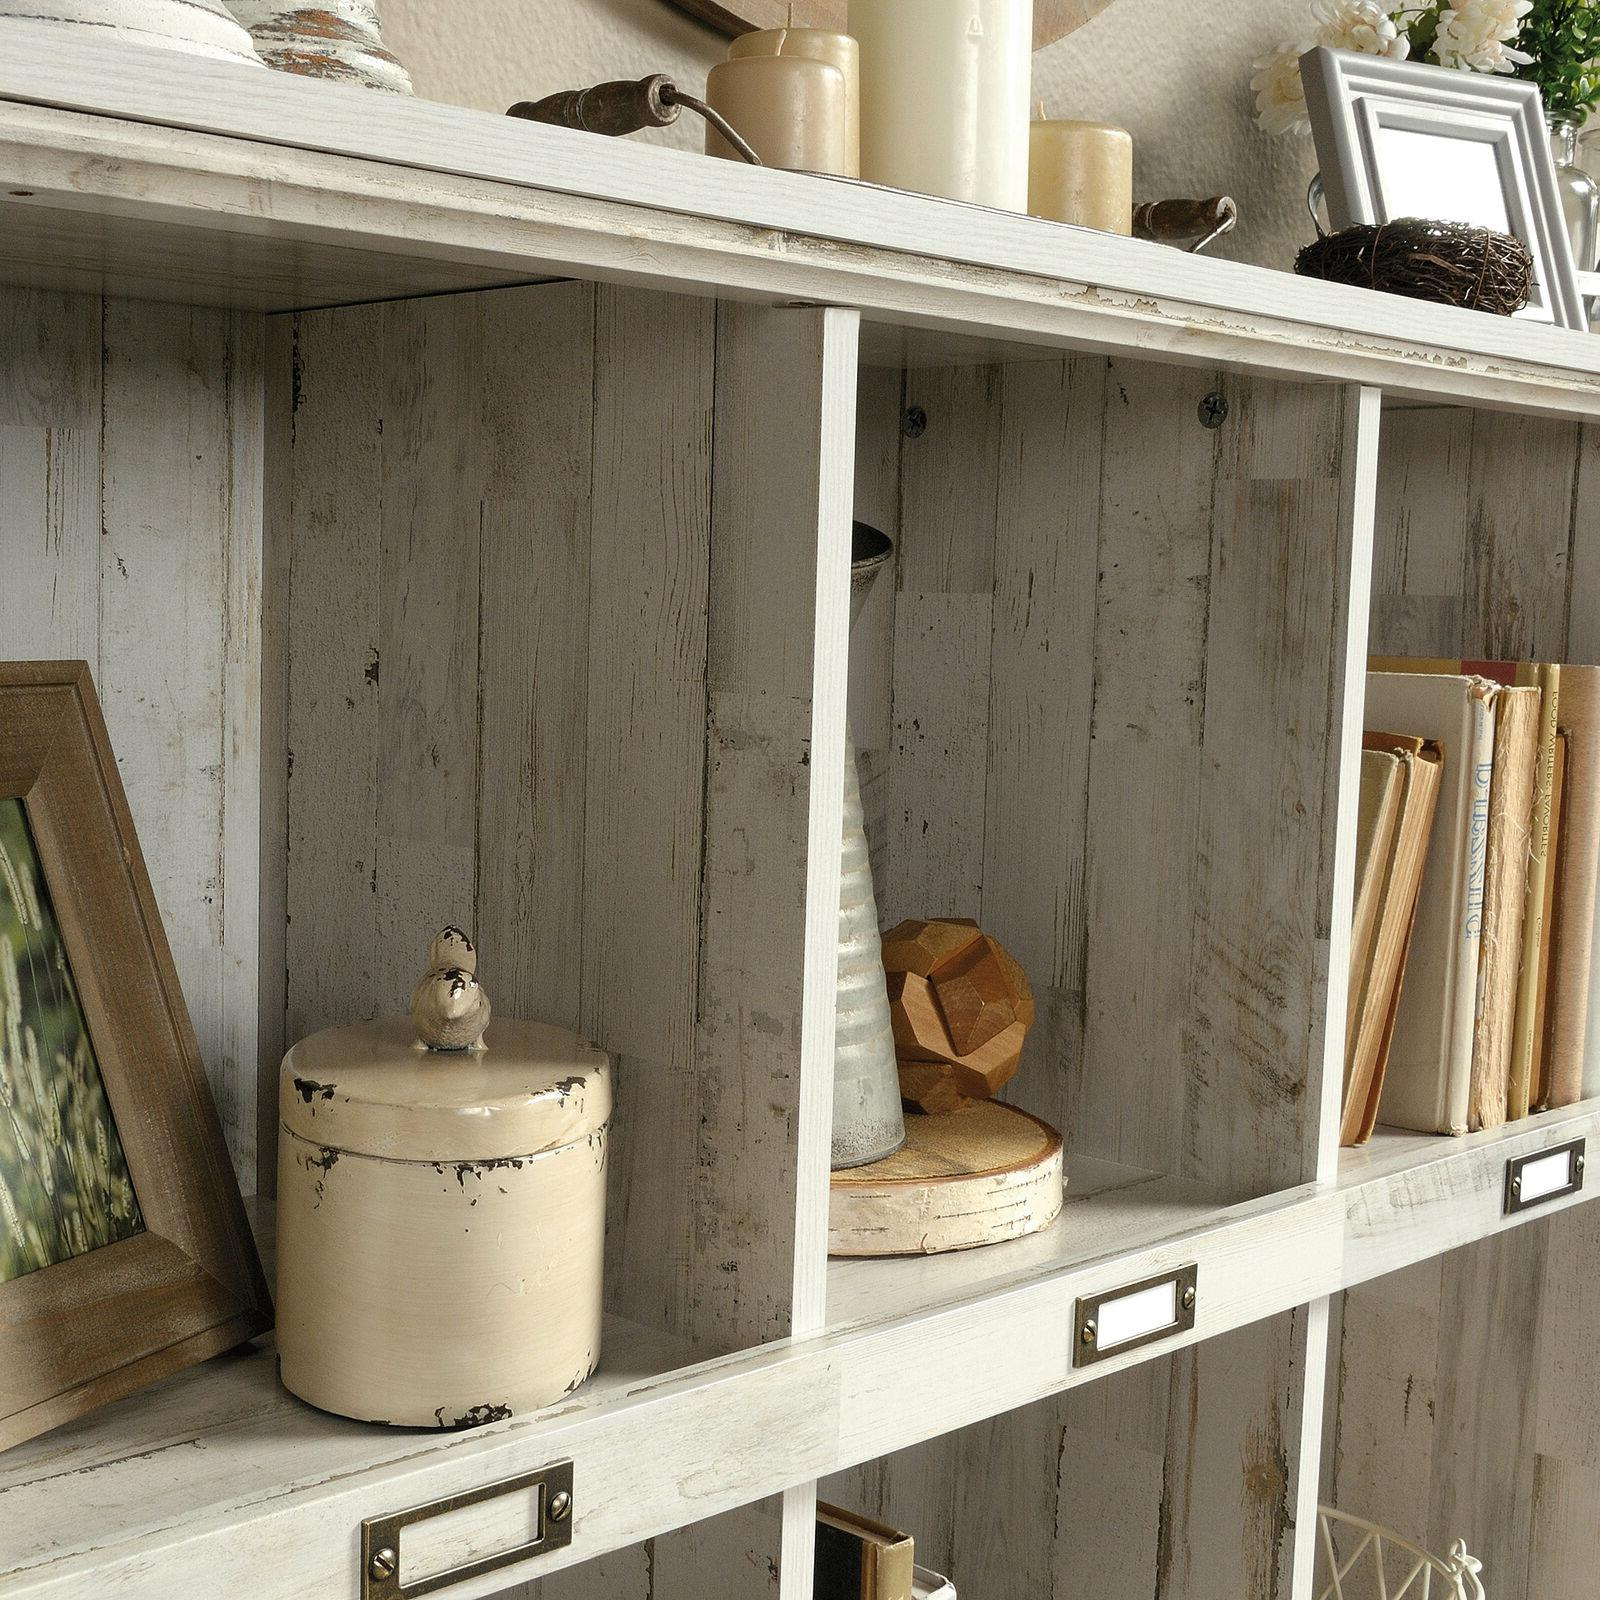 Storage Bin Organizer Living Room Bookshelf Furniture